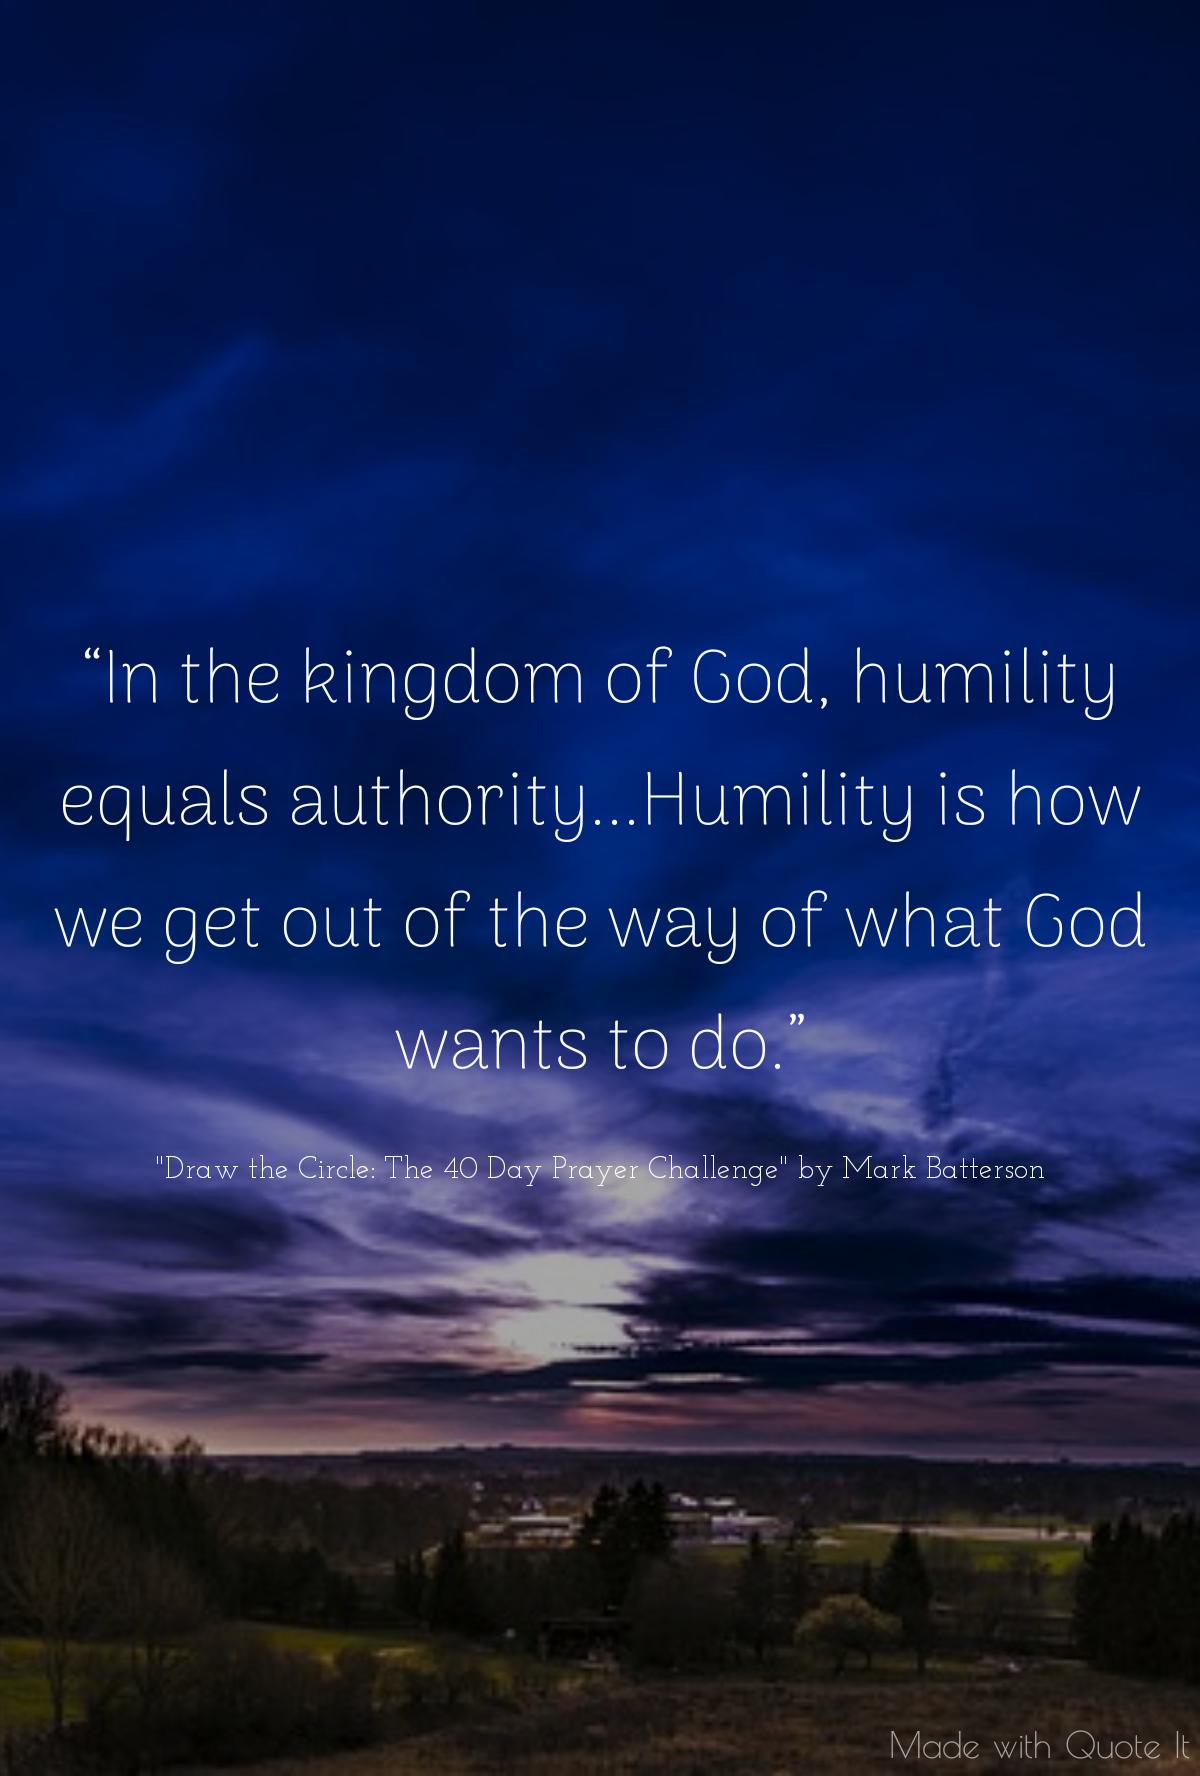 Humility = Authority